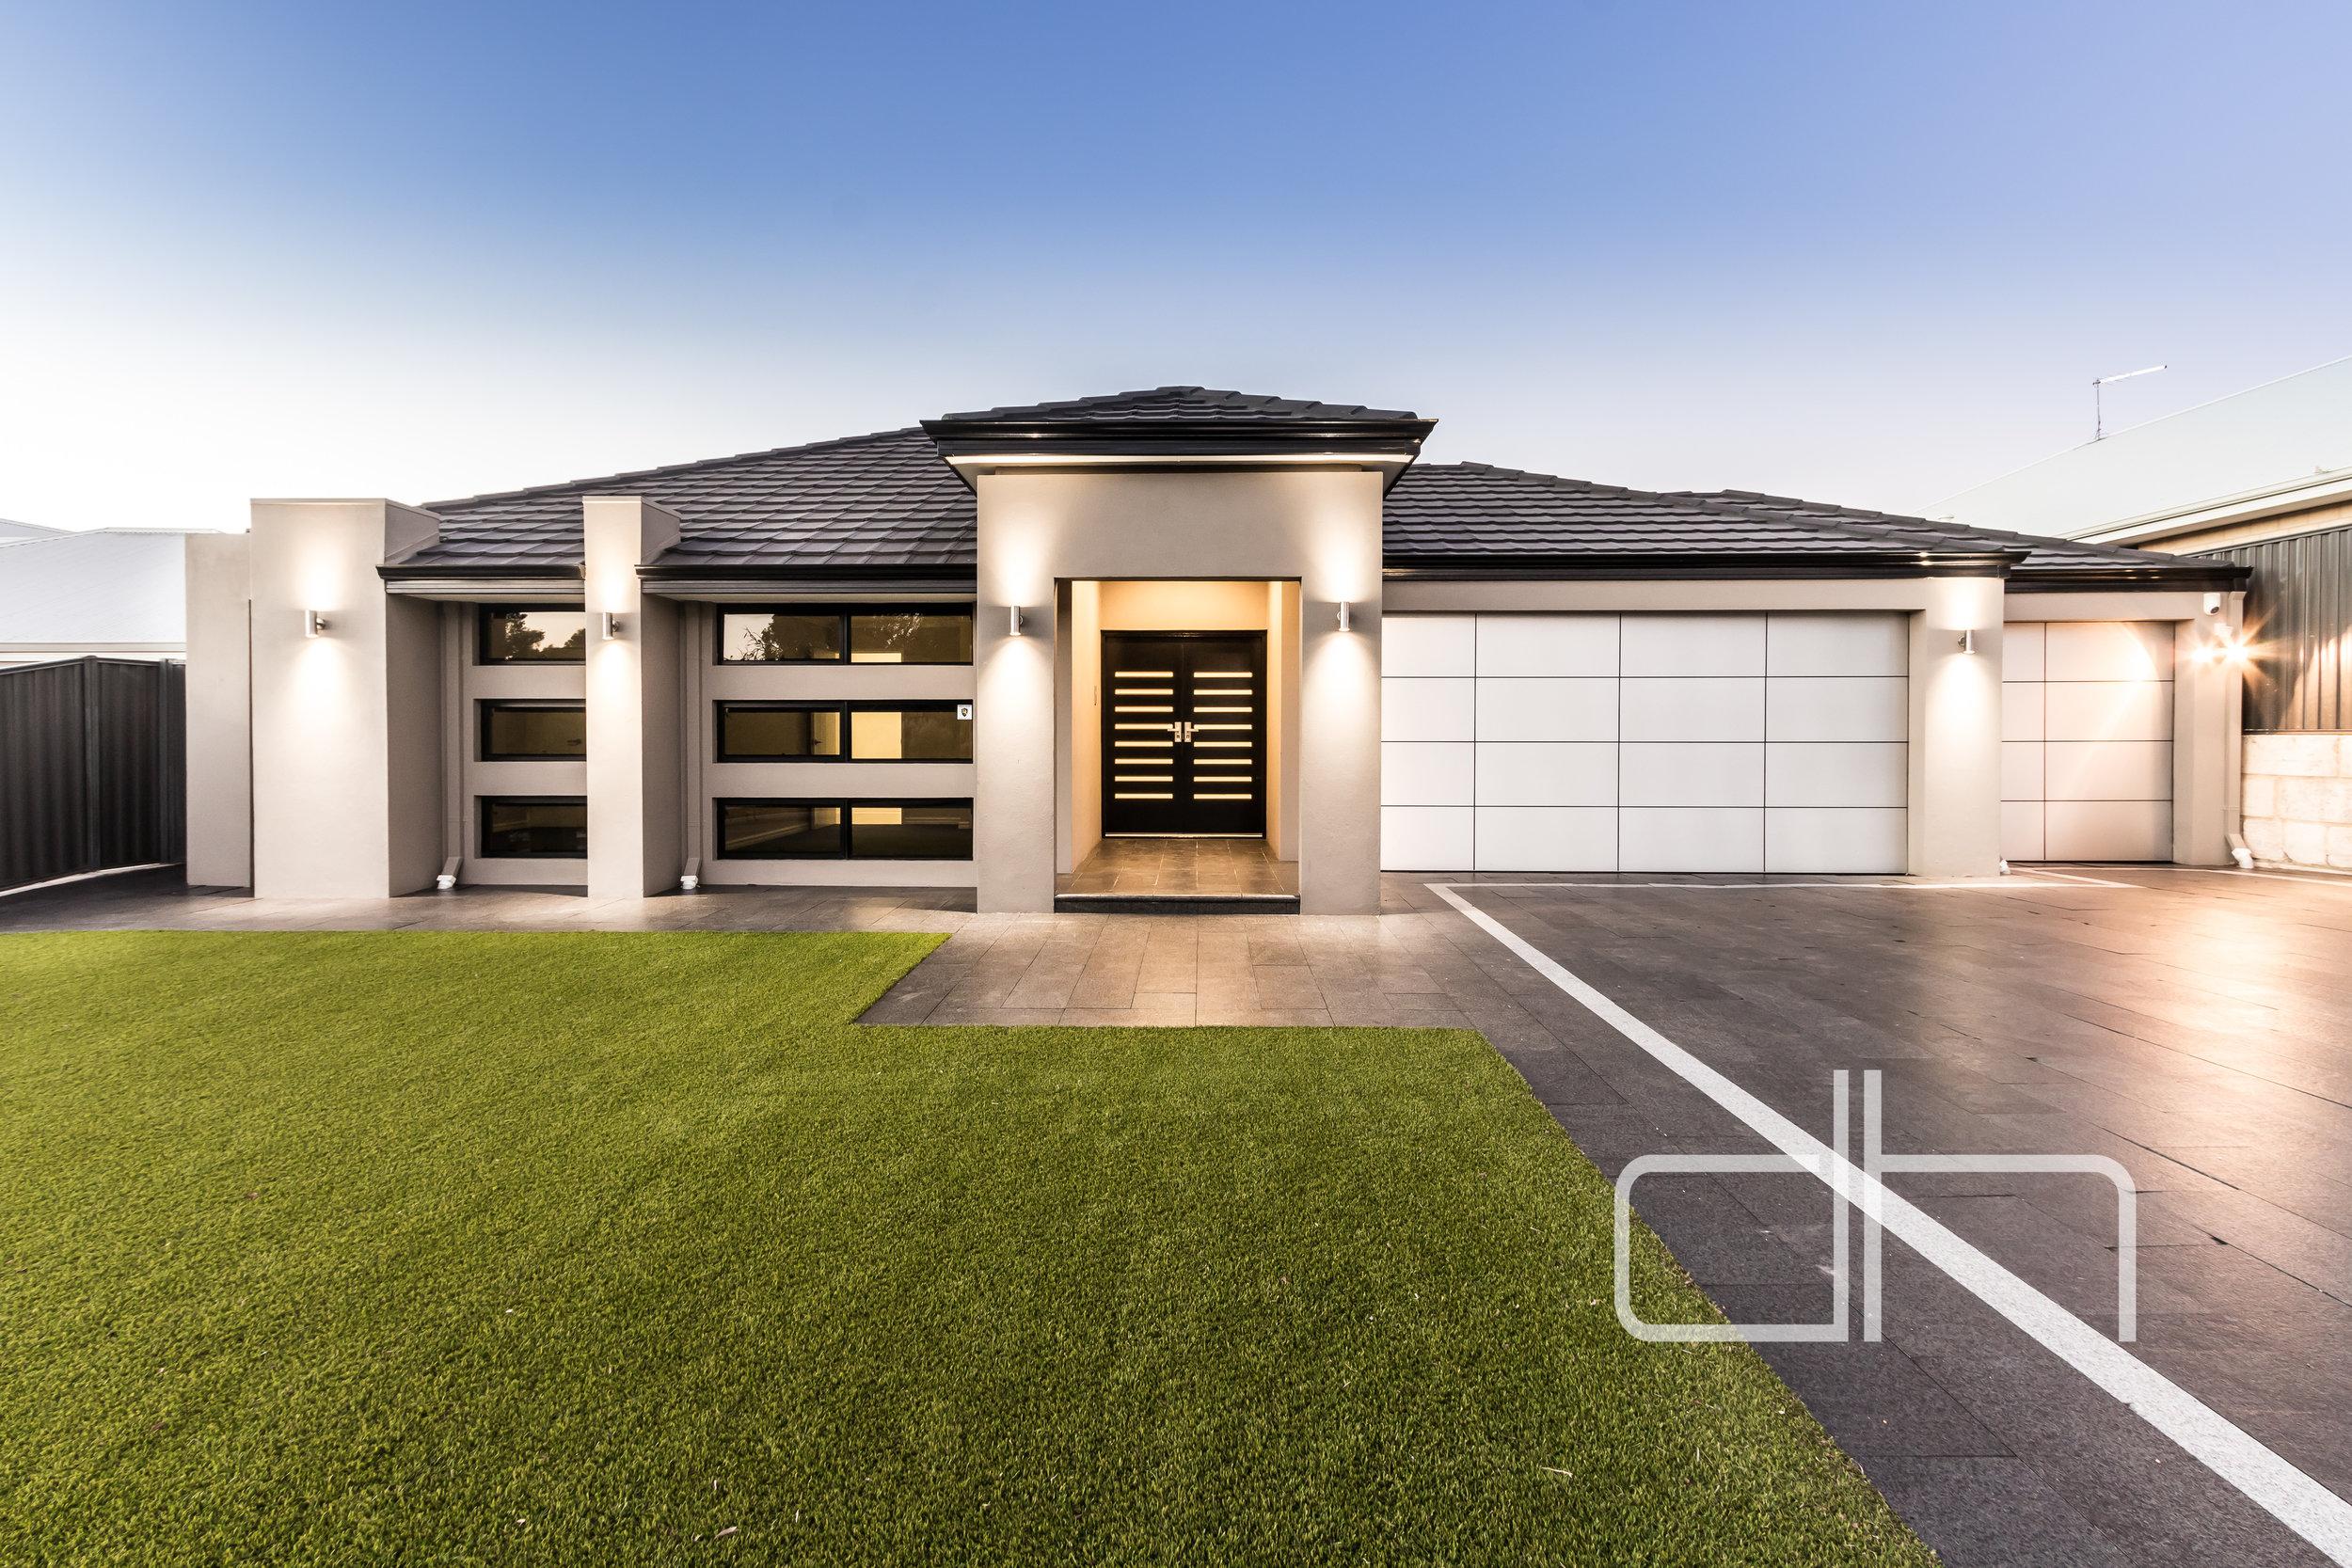 3 Bagatelle Road $745,000